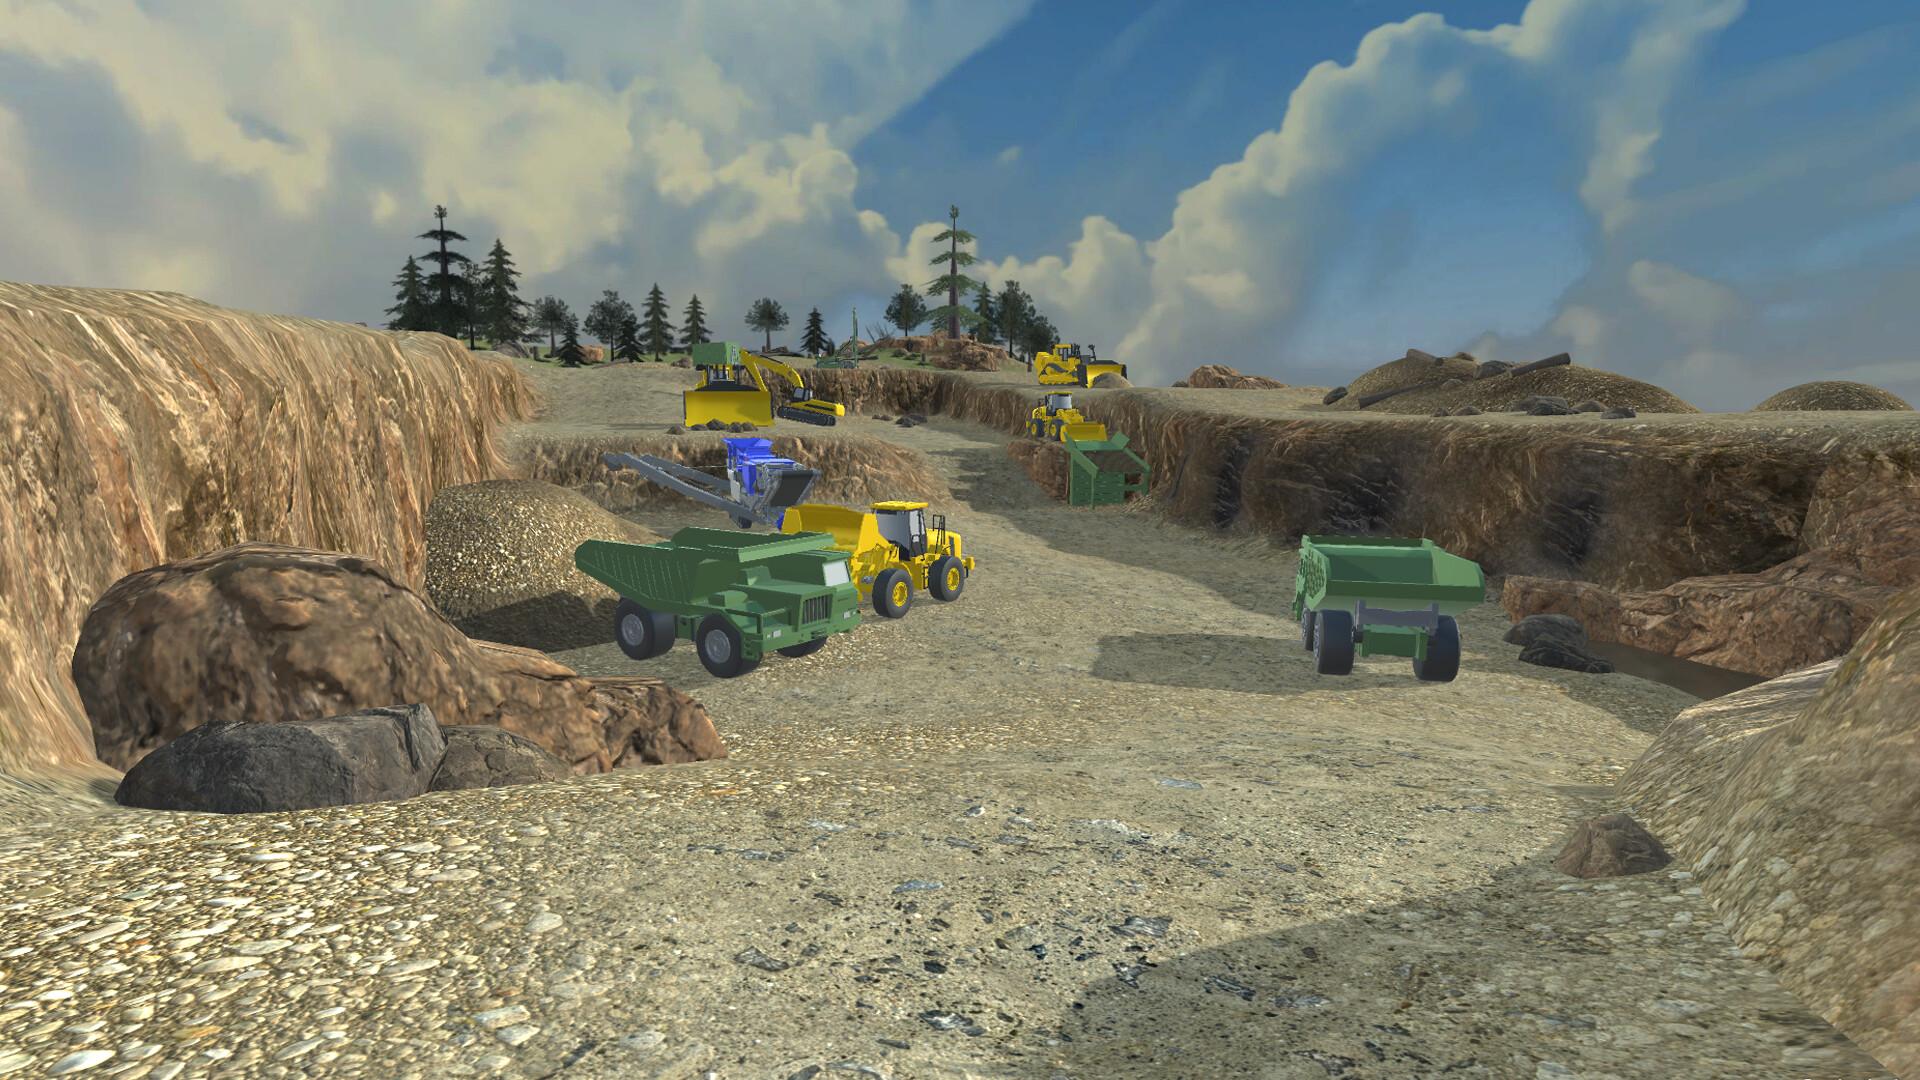 Jordan cameron quarry 2